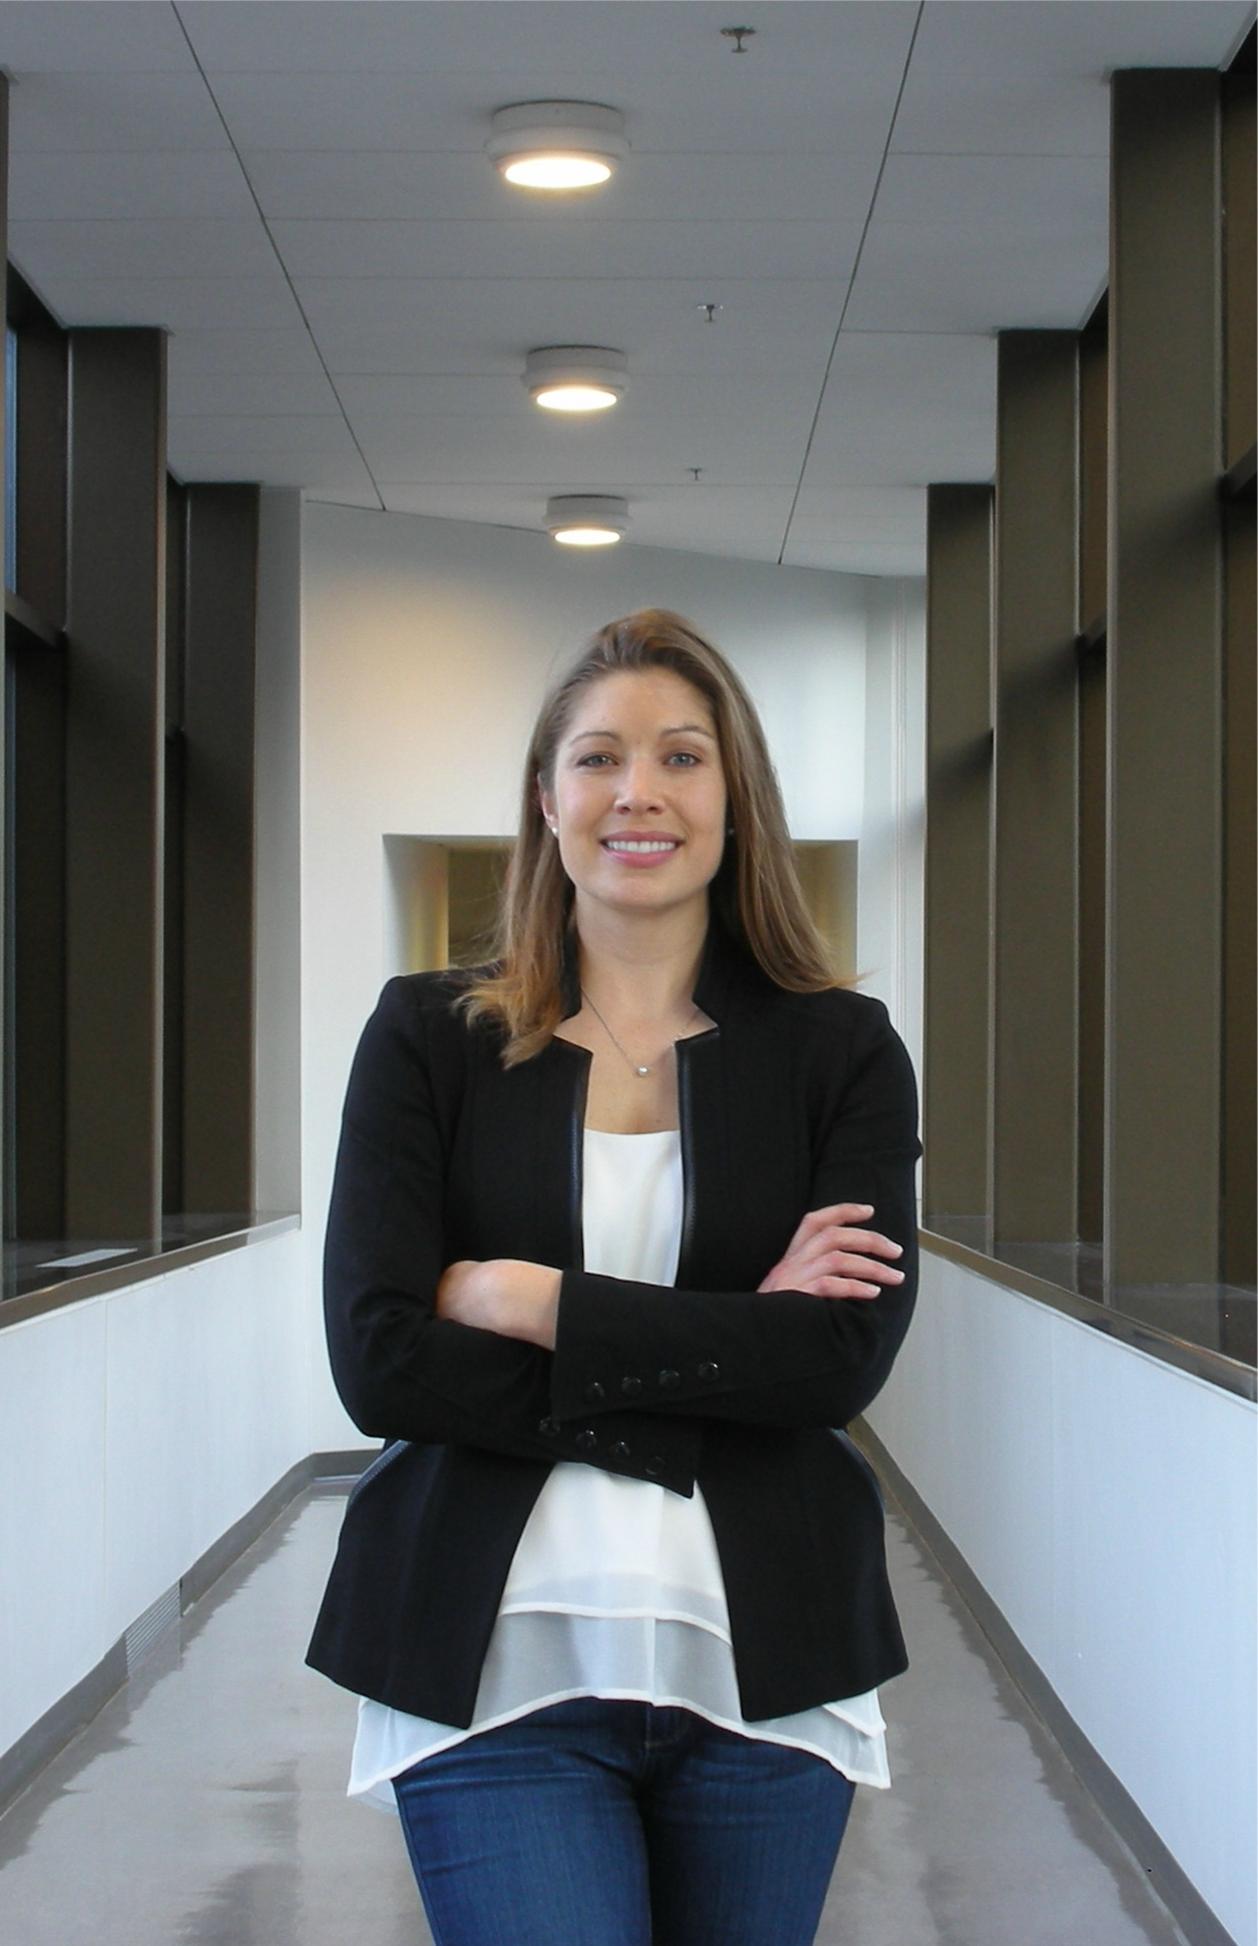 Catherine Musselman, PhD